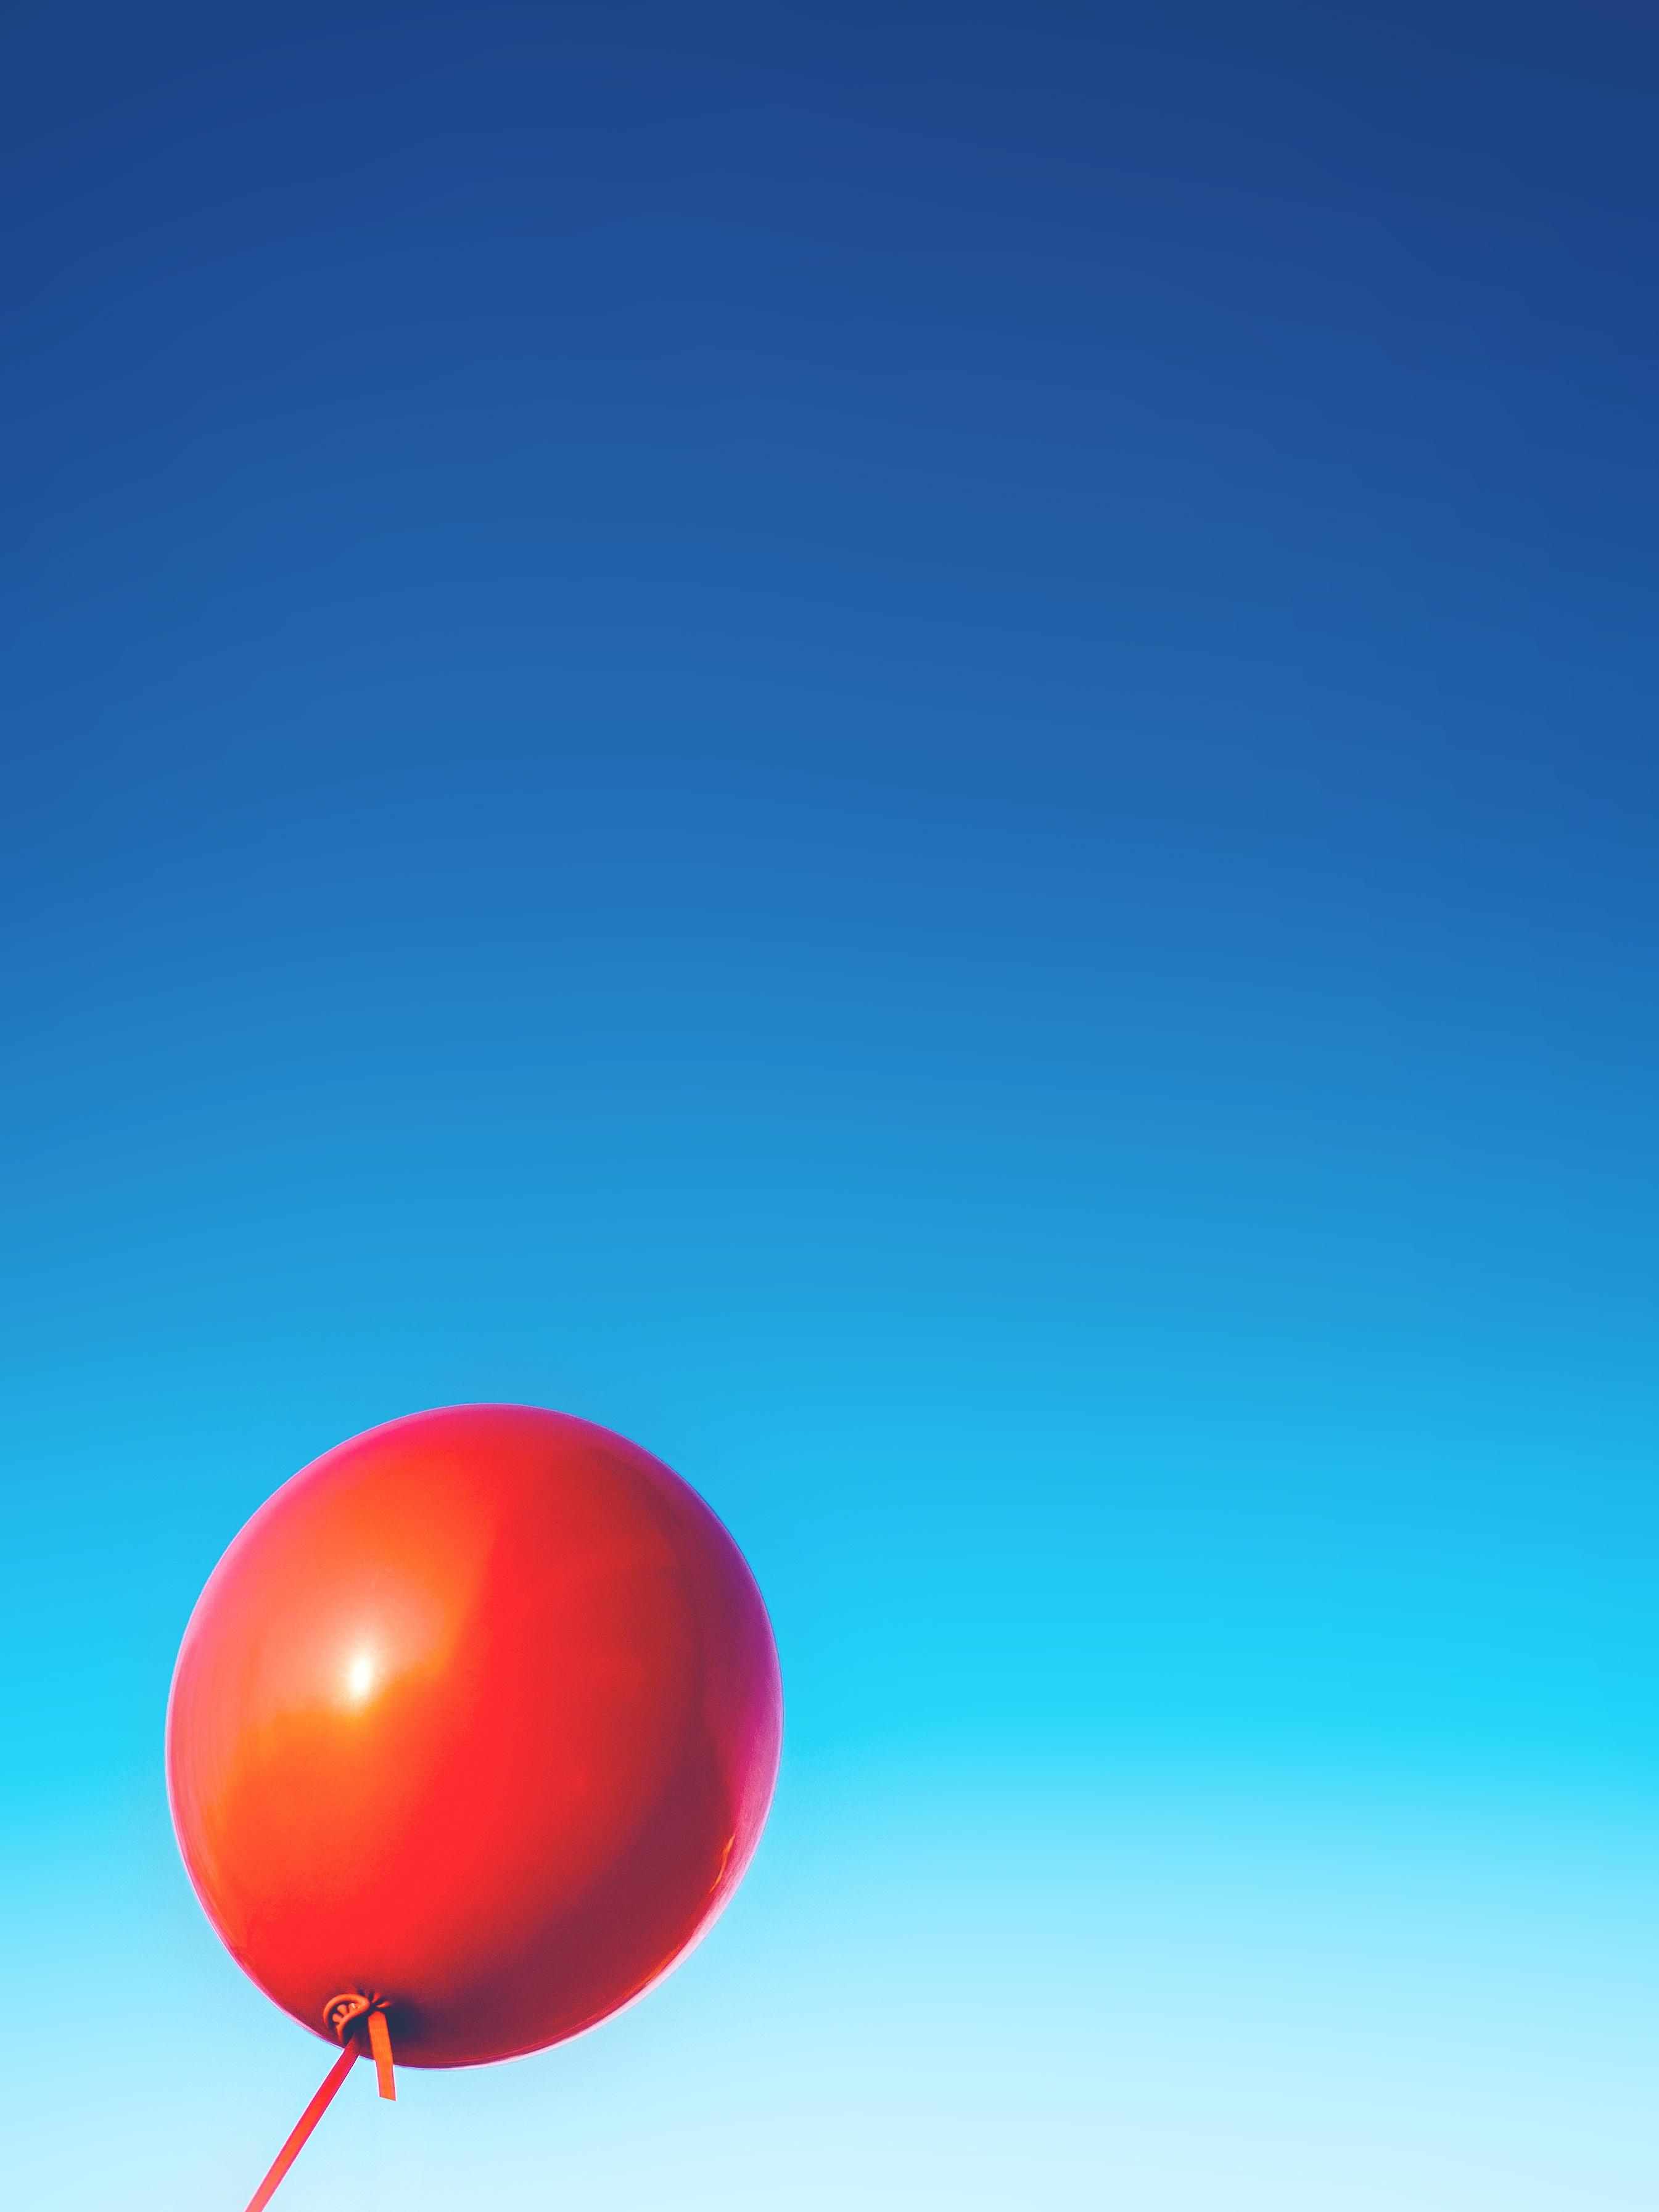 Gambar Langit Udara Bulat Balon Suasana Terbang